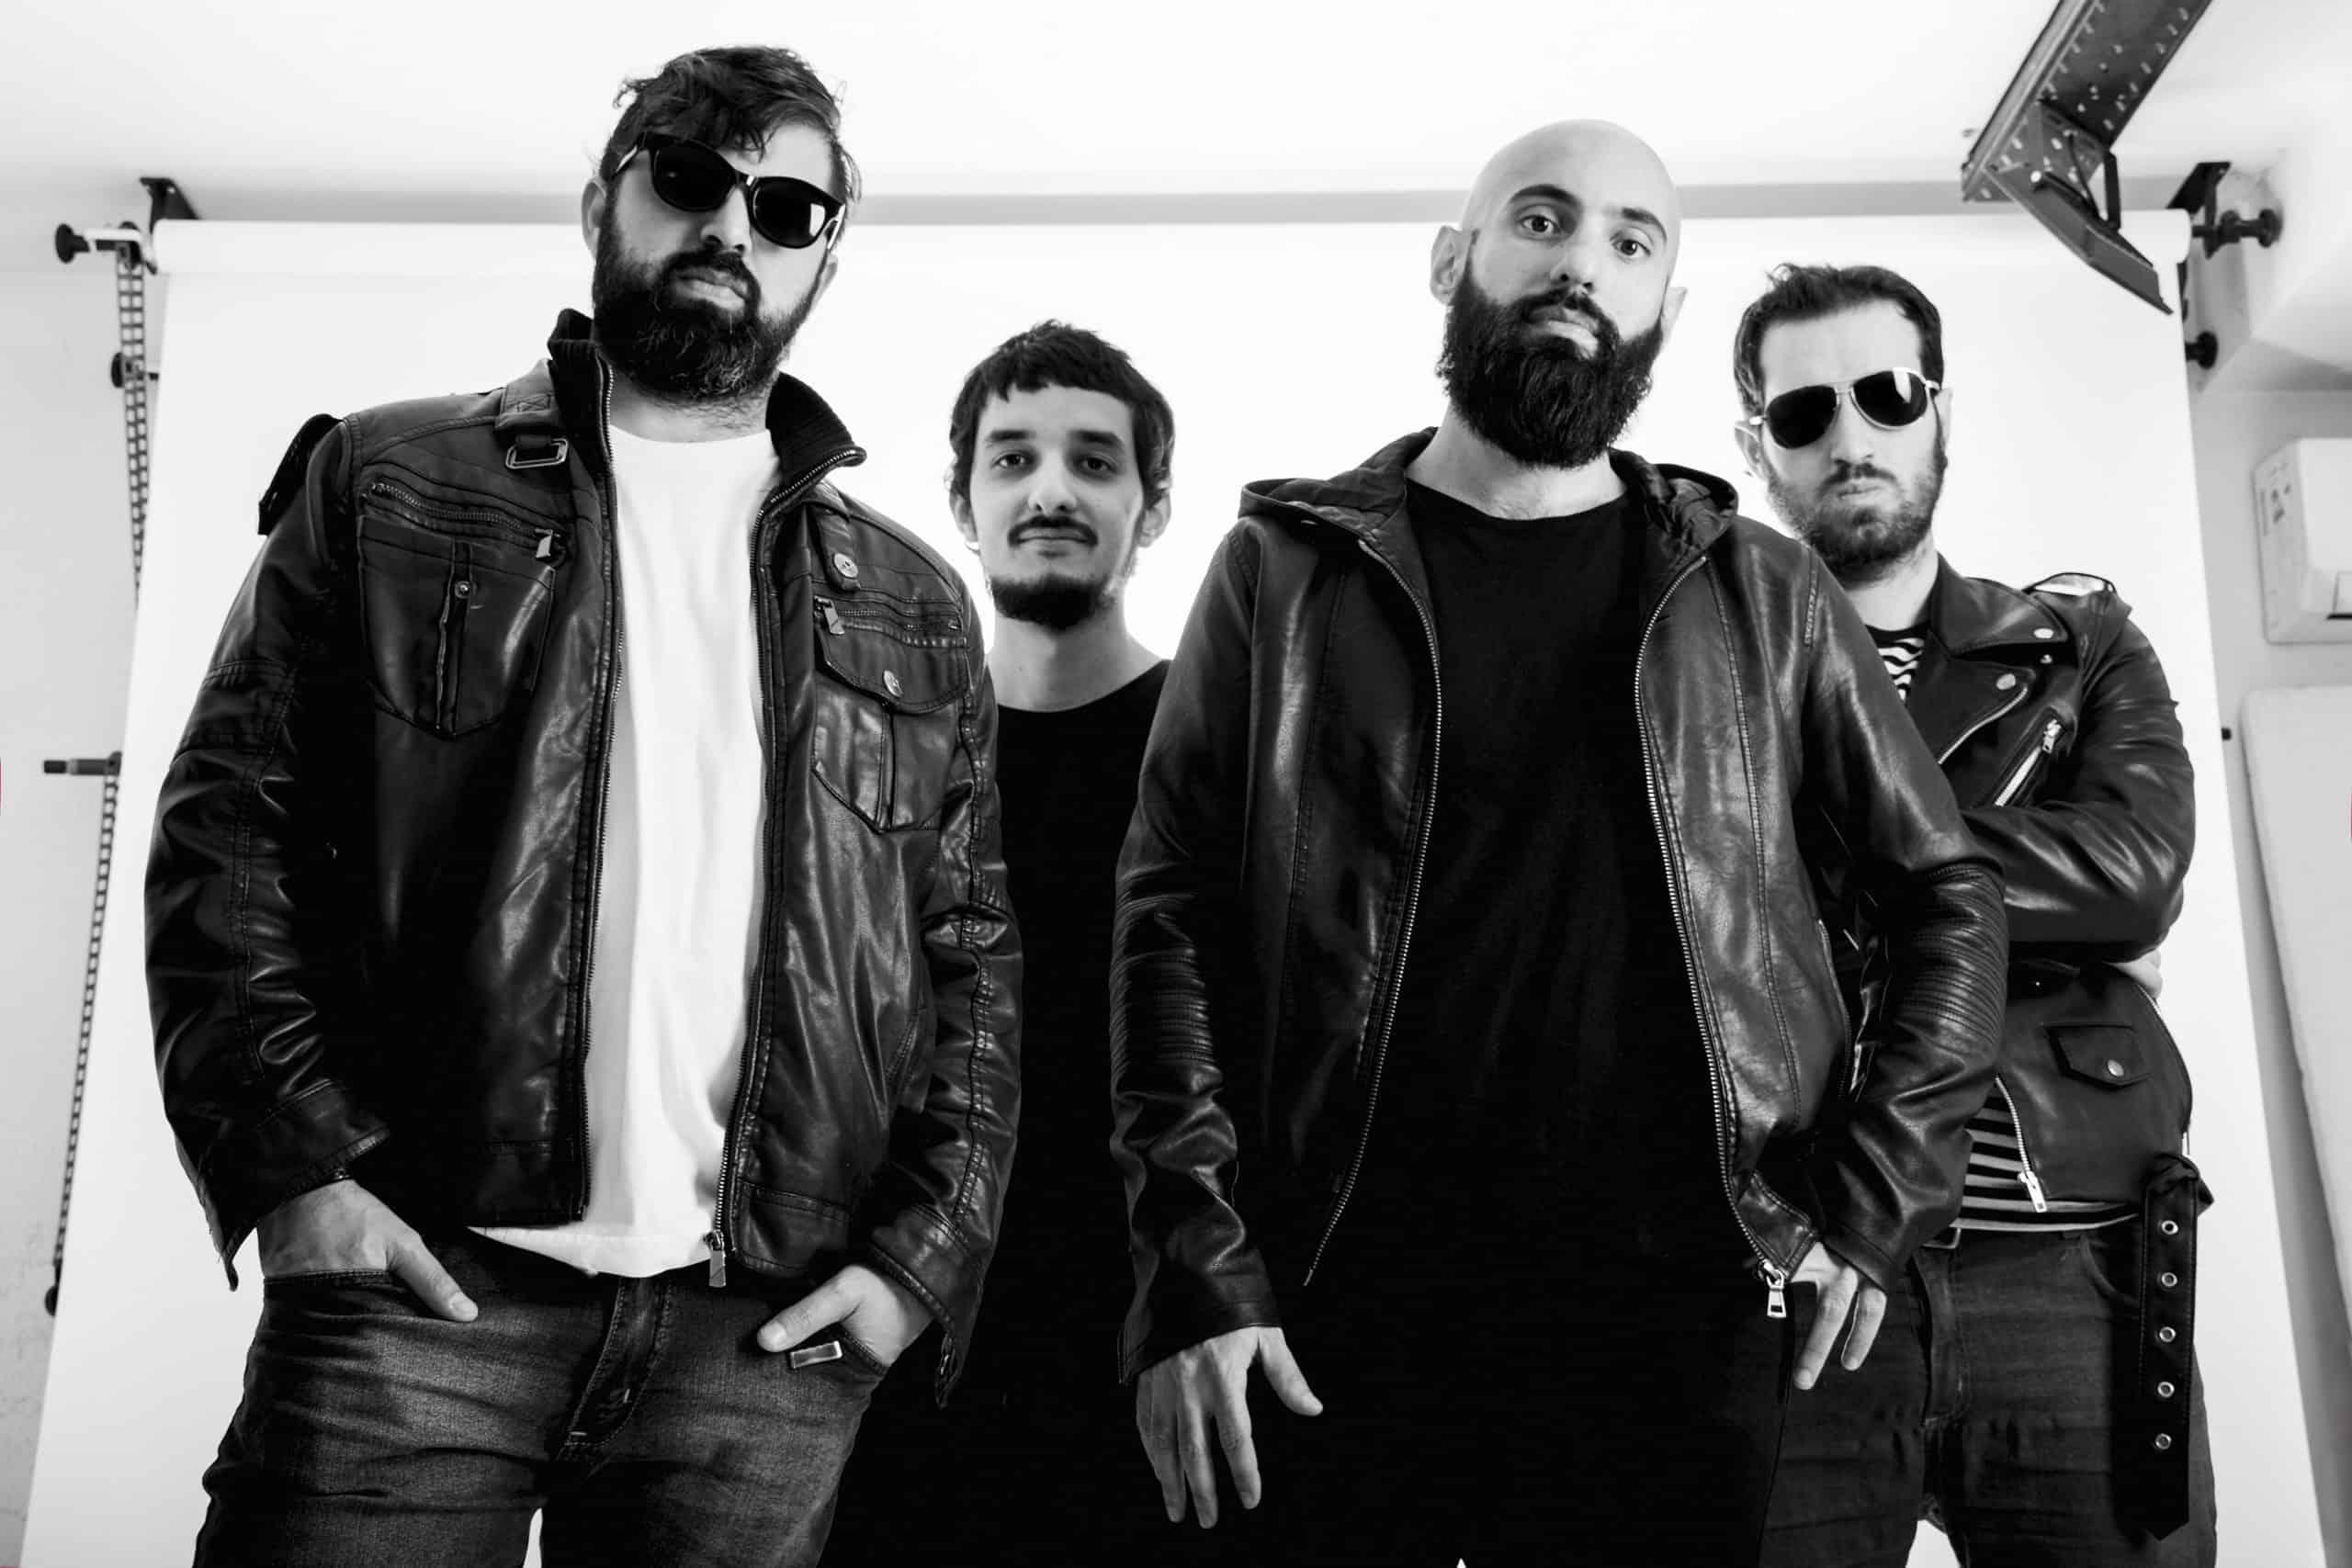 The Vostok lanza su álbum debut 3